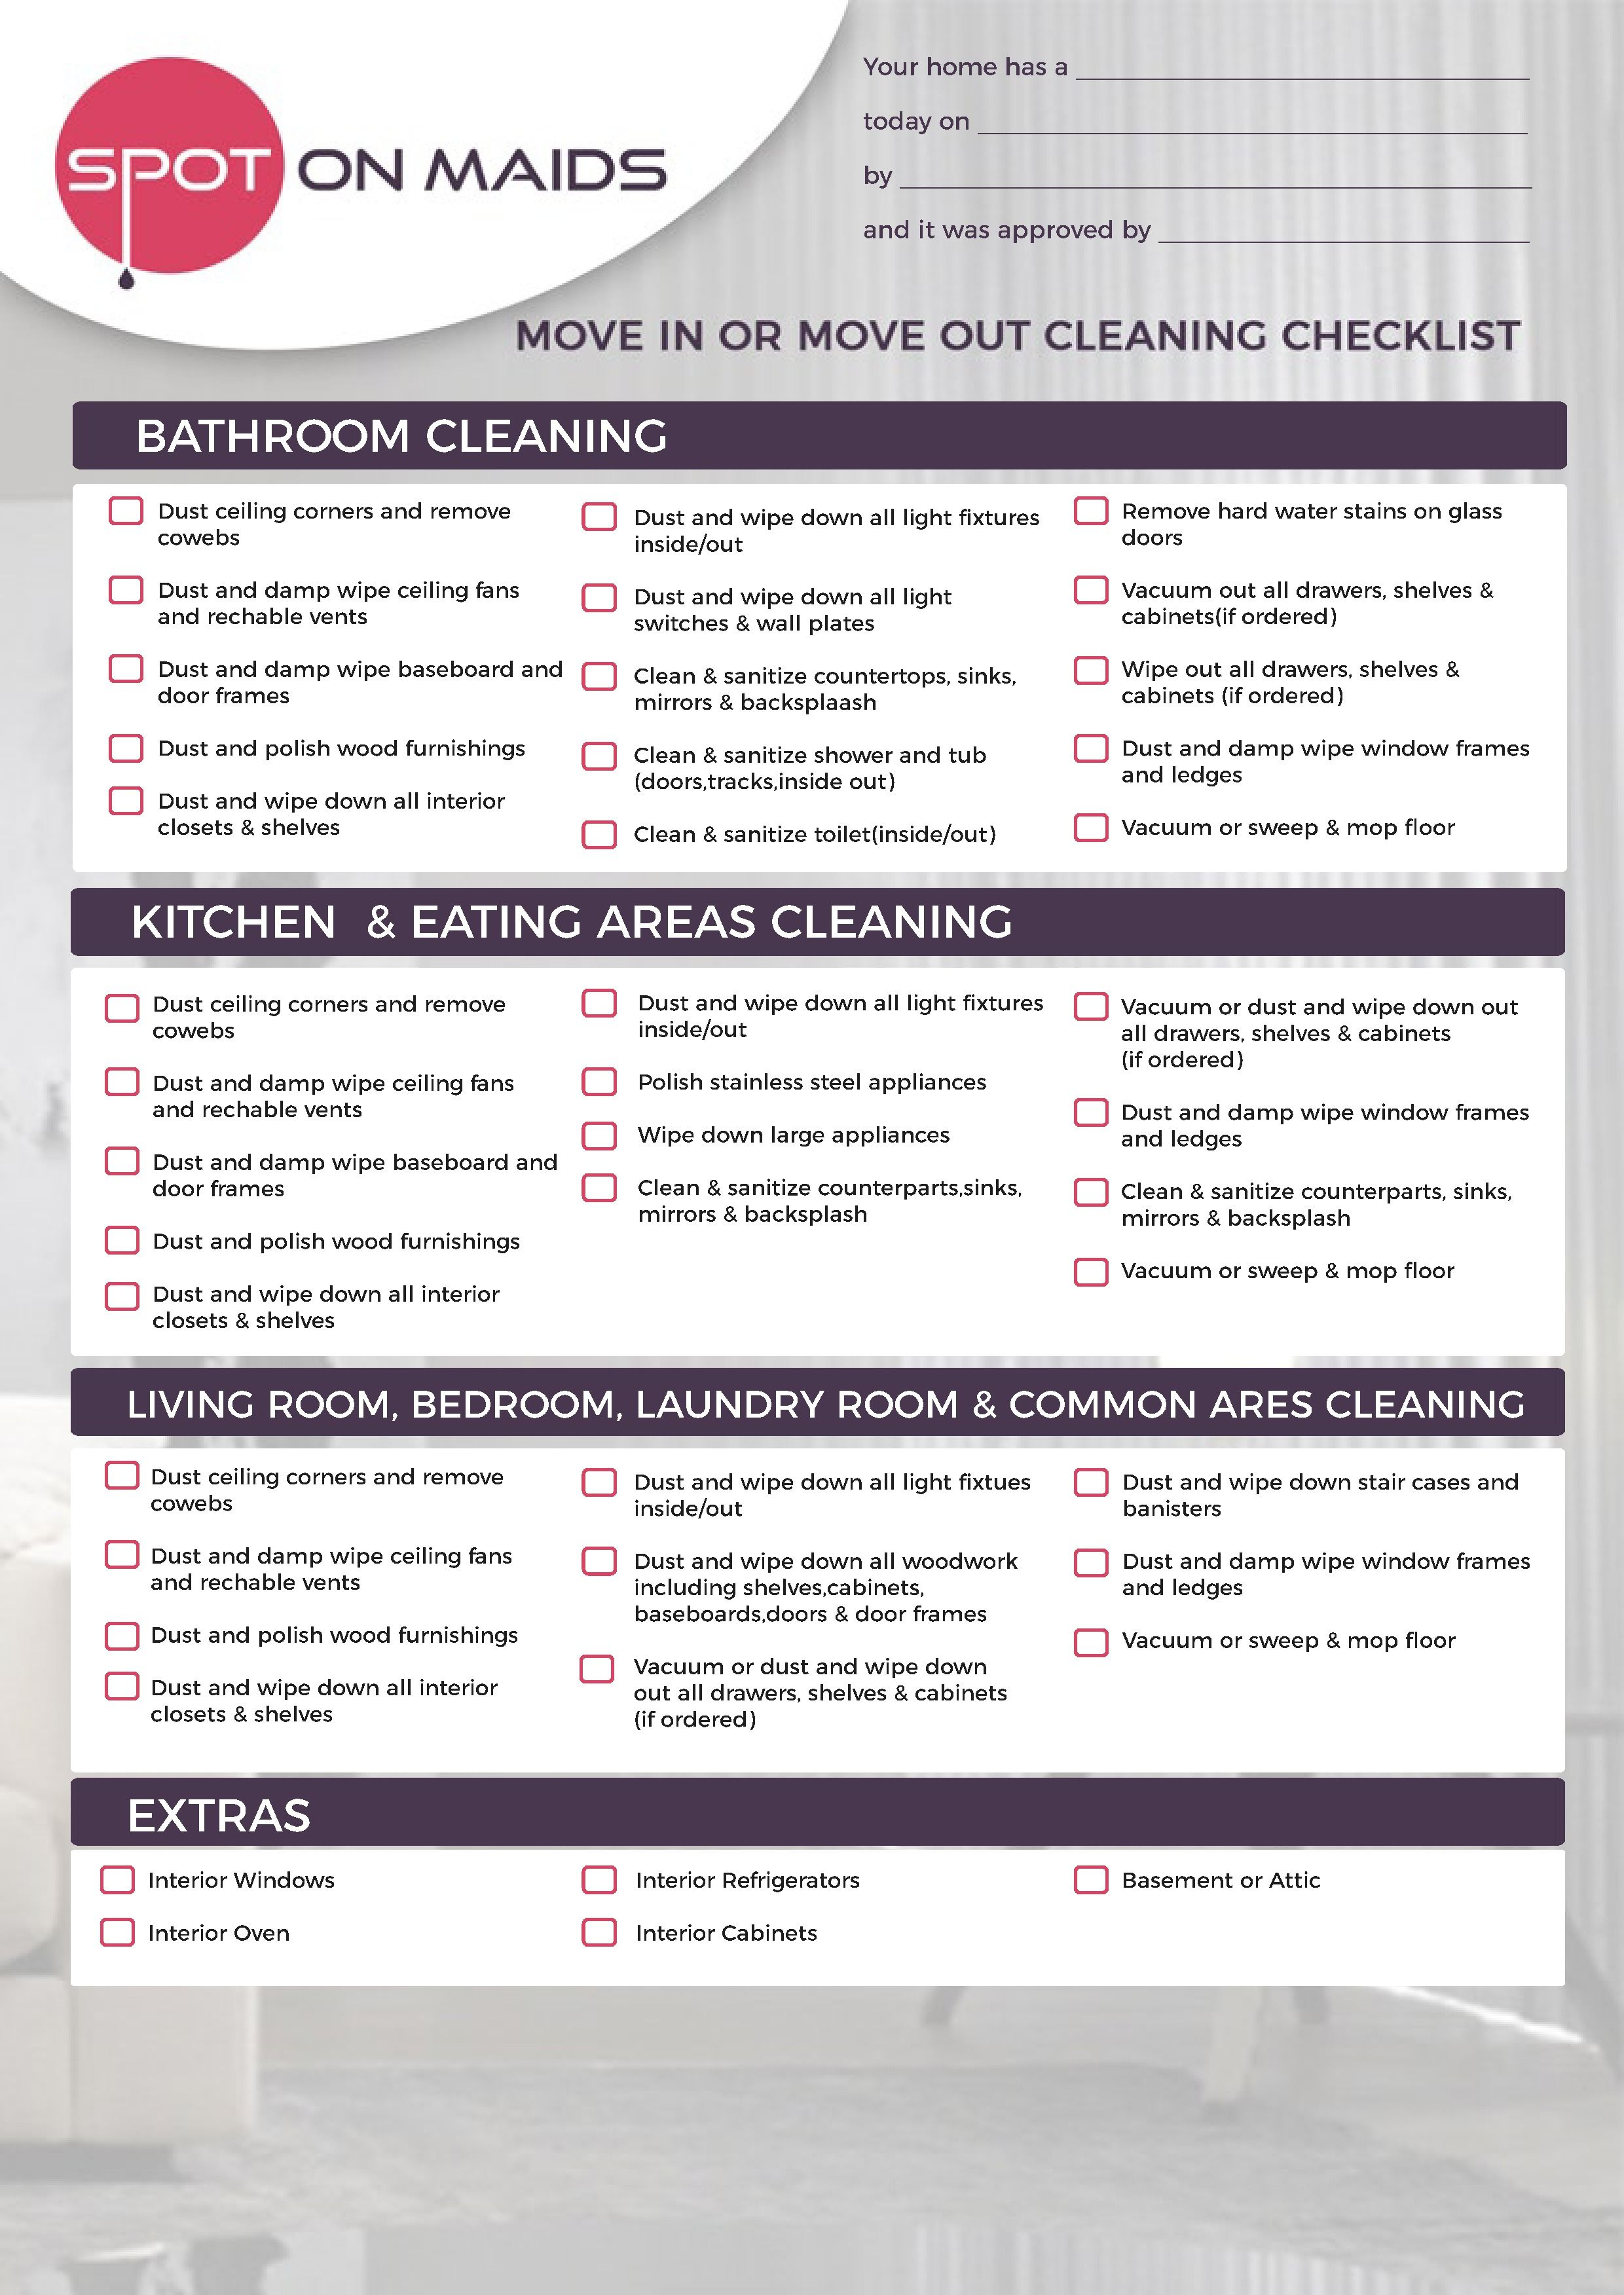 Cleaning Checklist Cleaning Checklist Cleaning Business House Cleaning Checklist Move out cleaning checklist template